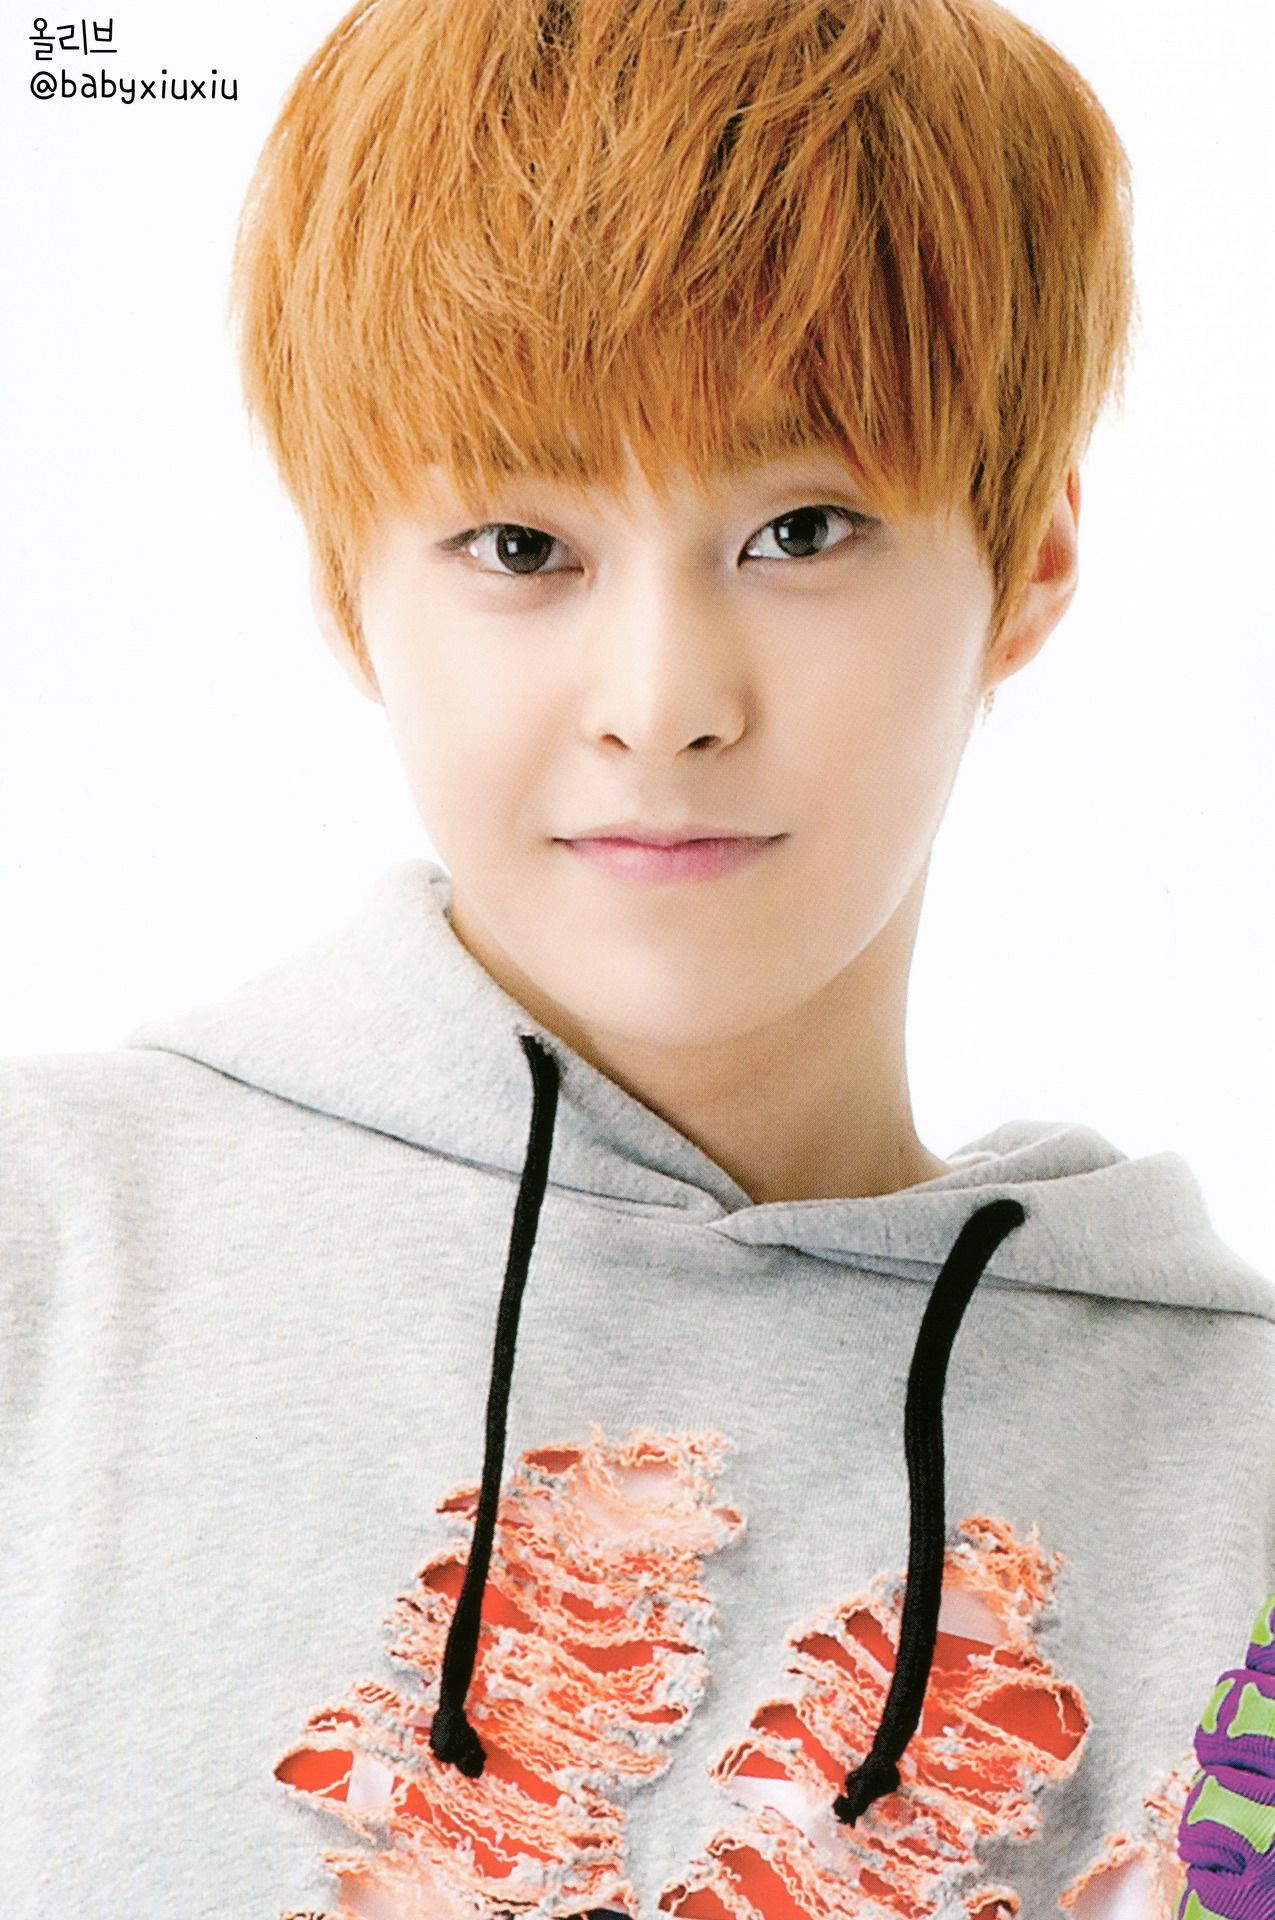 Xiumin || He's 25 but he looks like a baby :3 CUUUTTEE!엔젤카지노◕ JK1100.COM ◕ 엔젤카지노